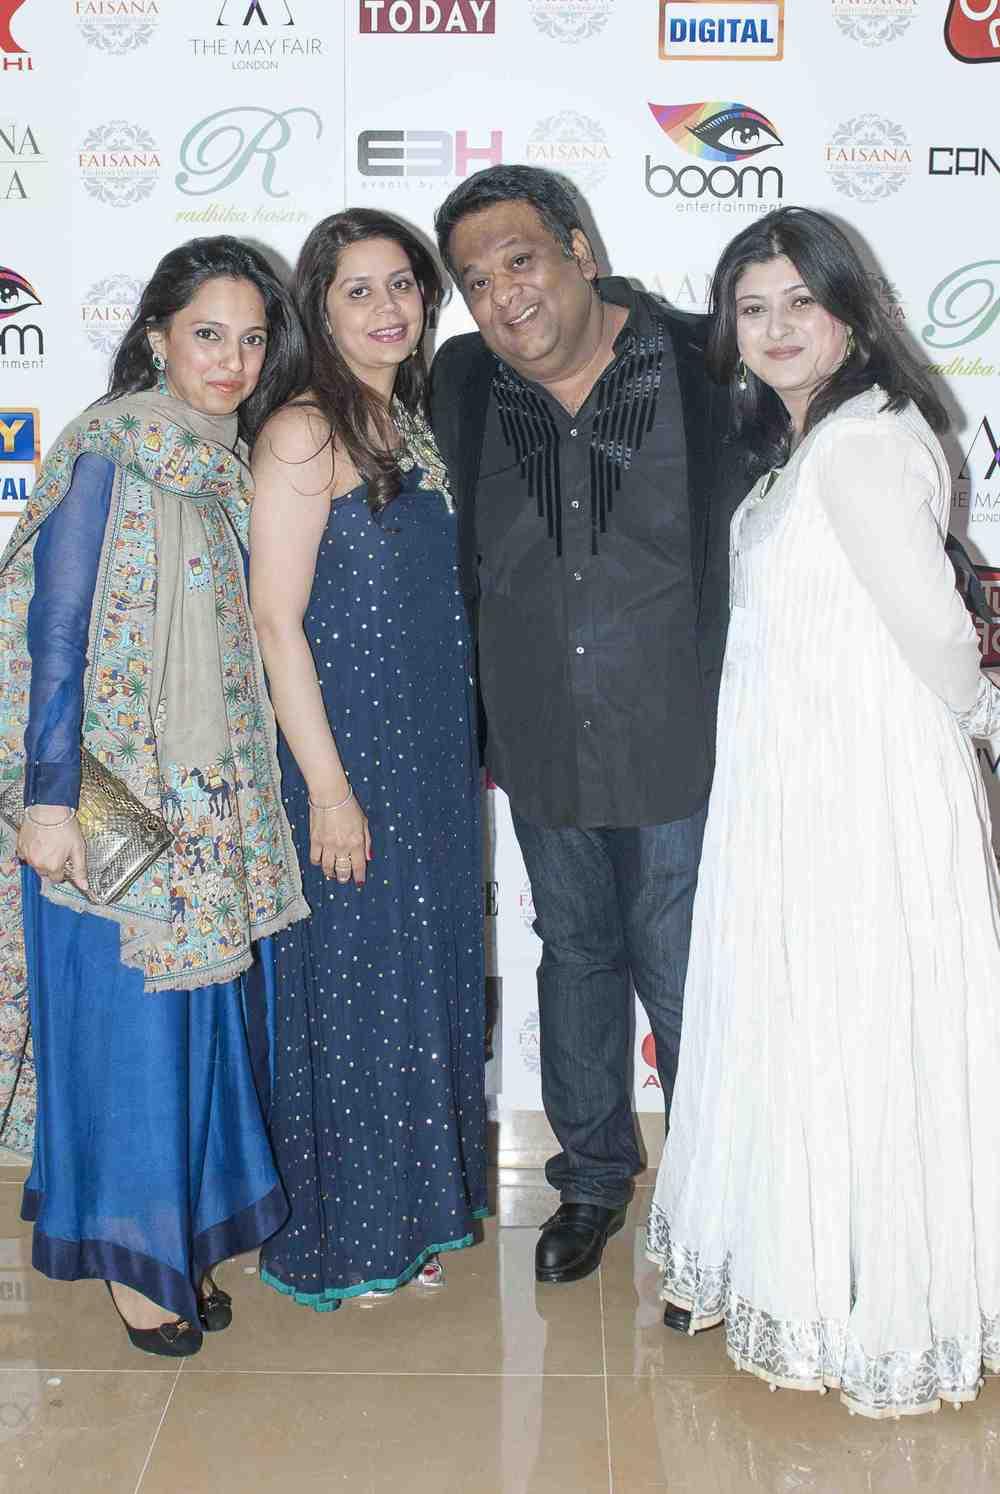 Nida Azwer, Aamna Lakhany, Umar Sayeed, Aisha Tabani Chowdhry.jpg